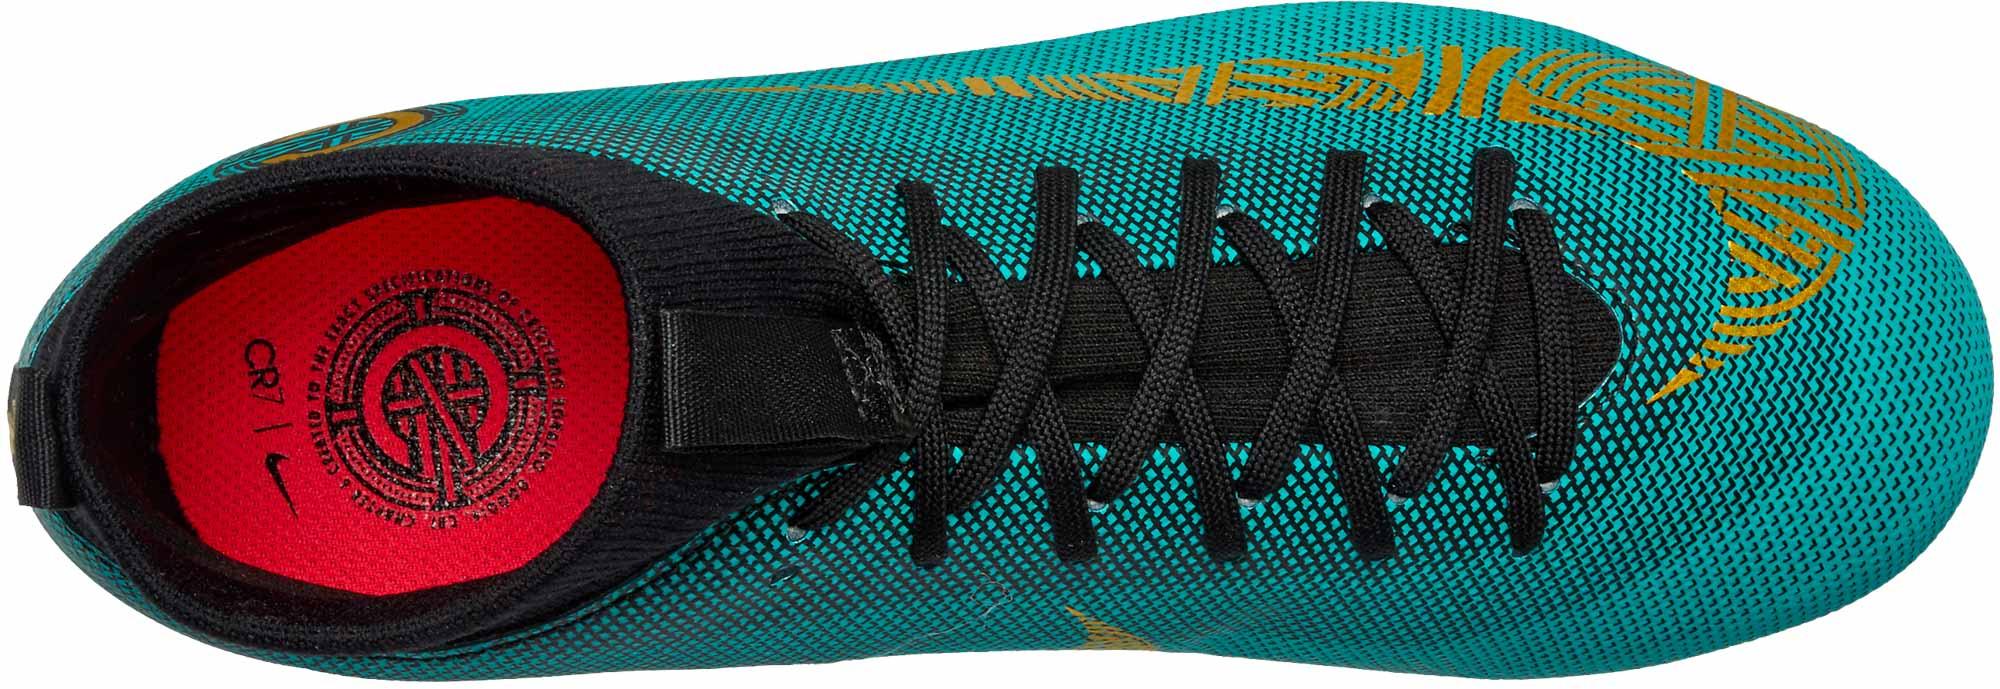 3649d43d5 Nike Mercurial Superfly 6 Academy MG - CR7 - Youth - Clear Jade ...